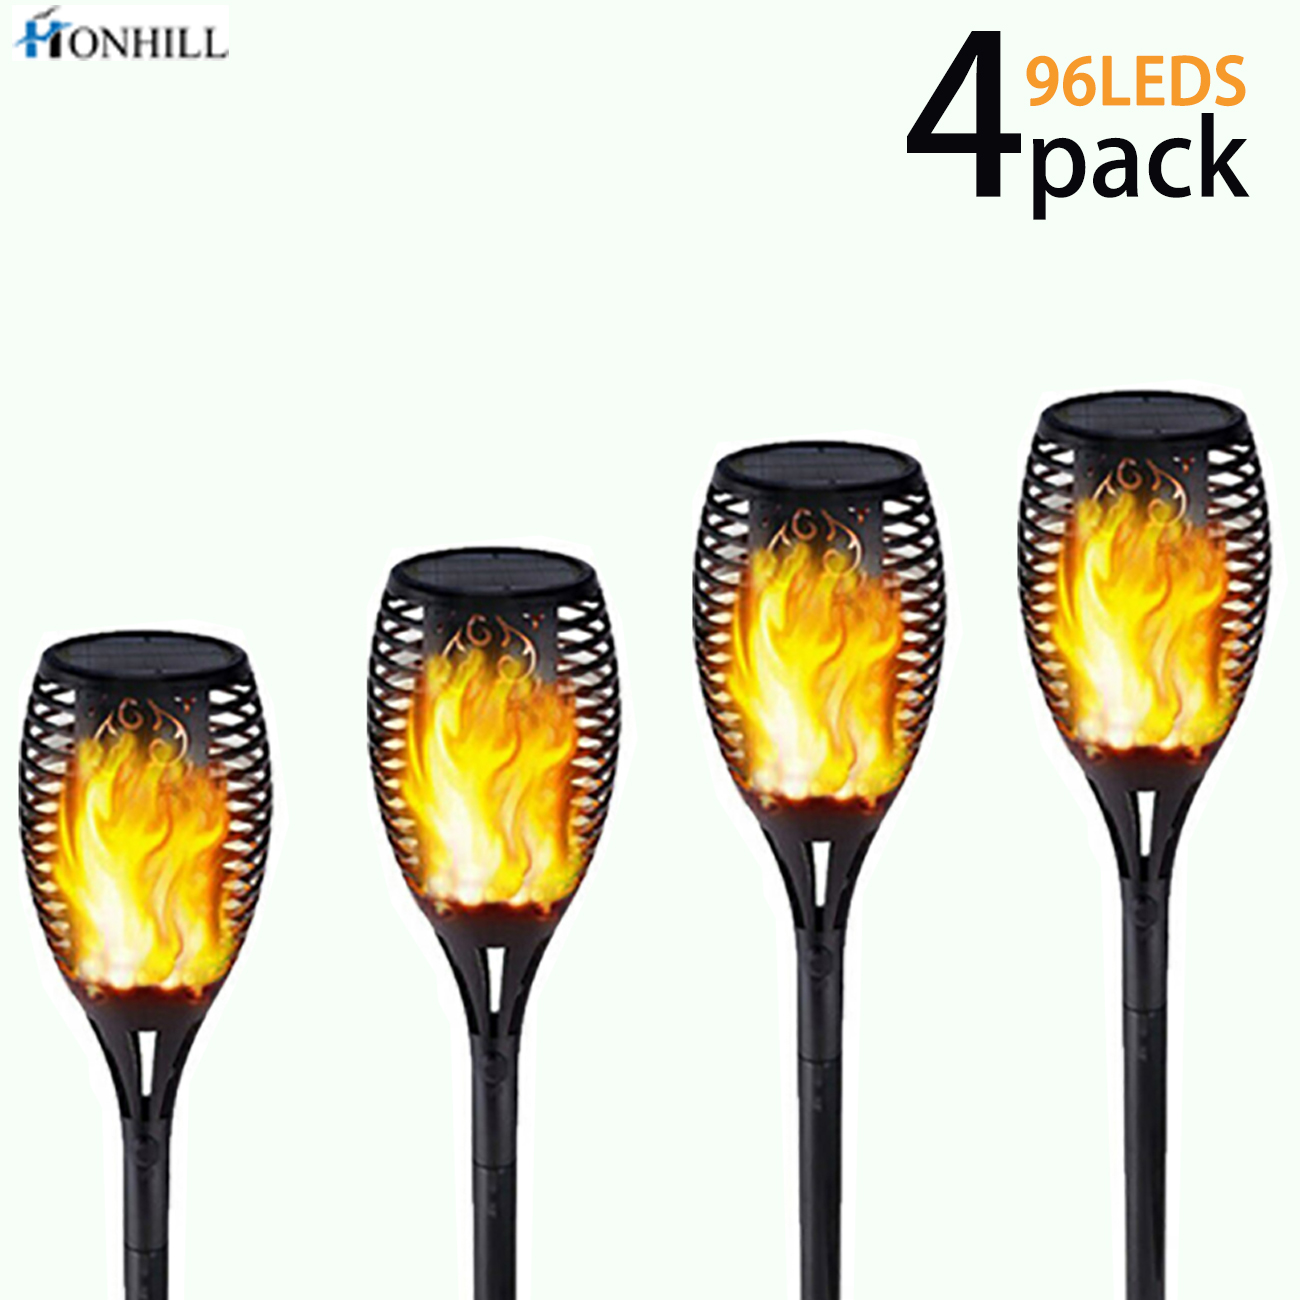 Honhill 33/96 LED Garden Lighting Waterproof Solar Light Automatically Outdoor Landscape Lamp Flame Lights